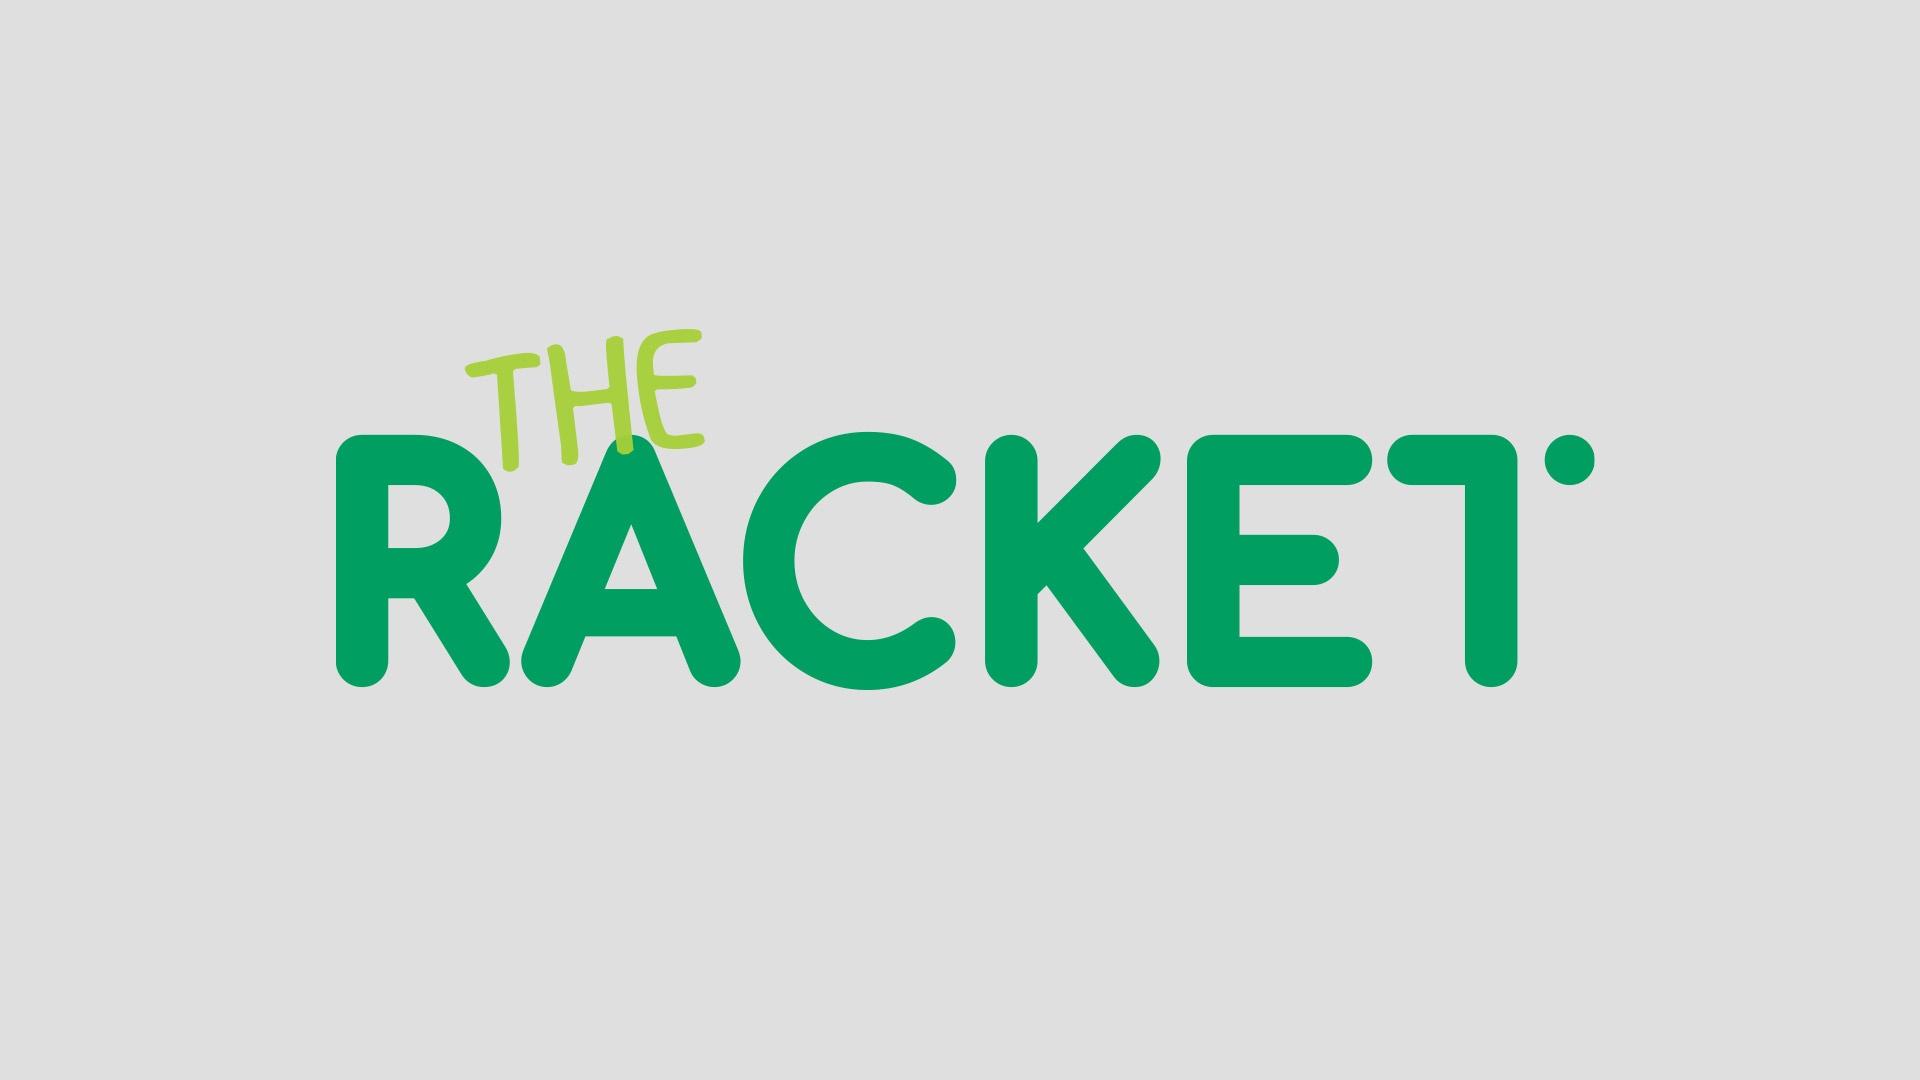 The Racket Image 5